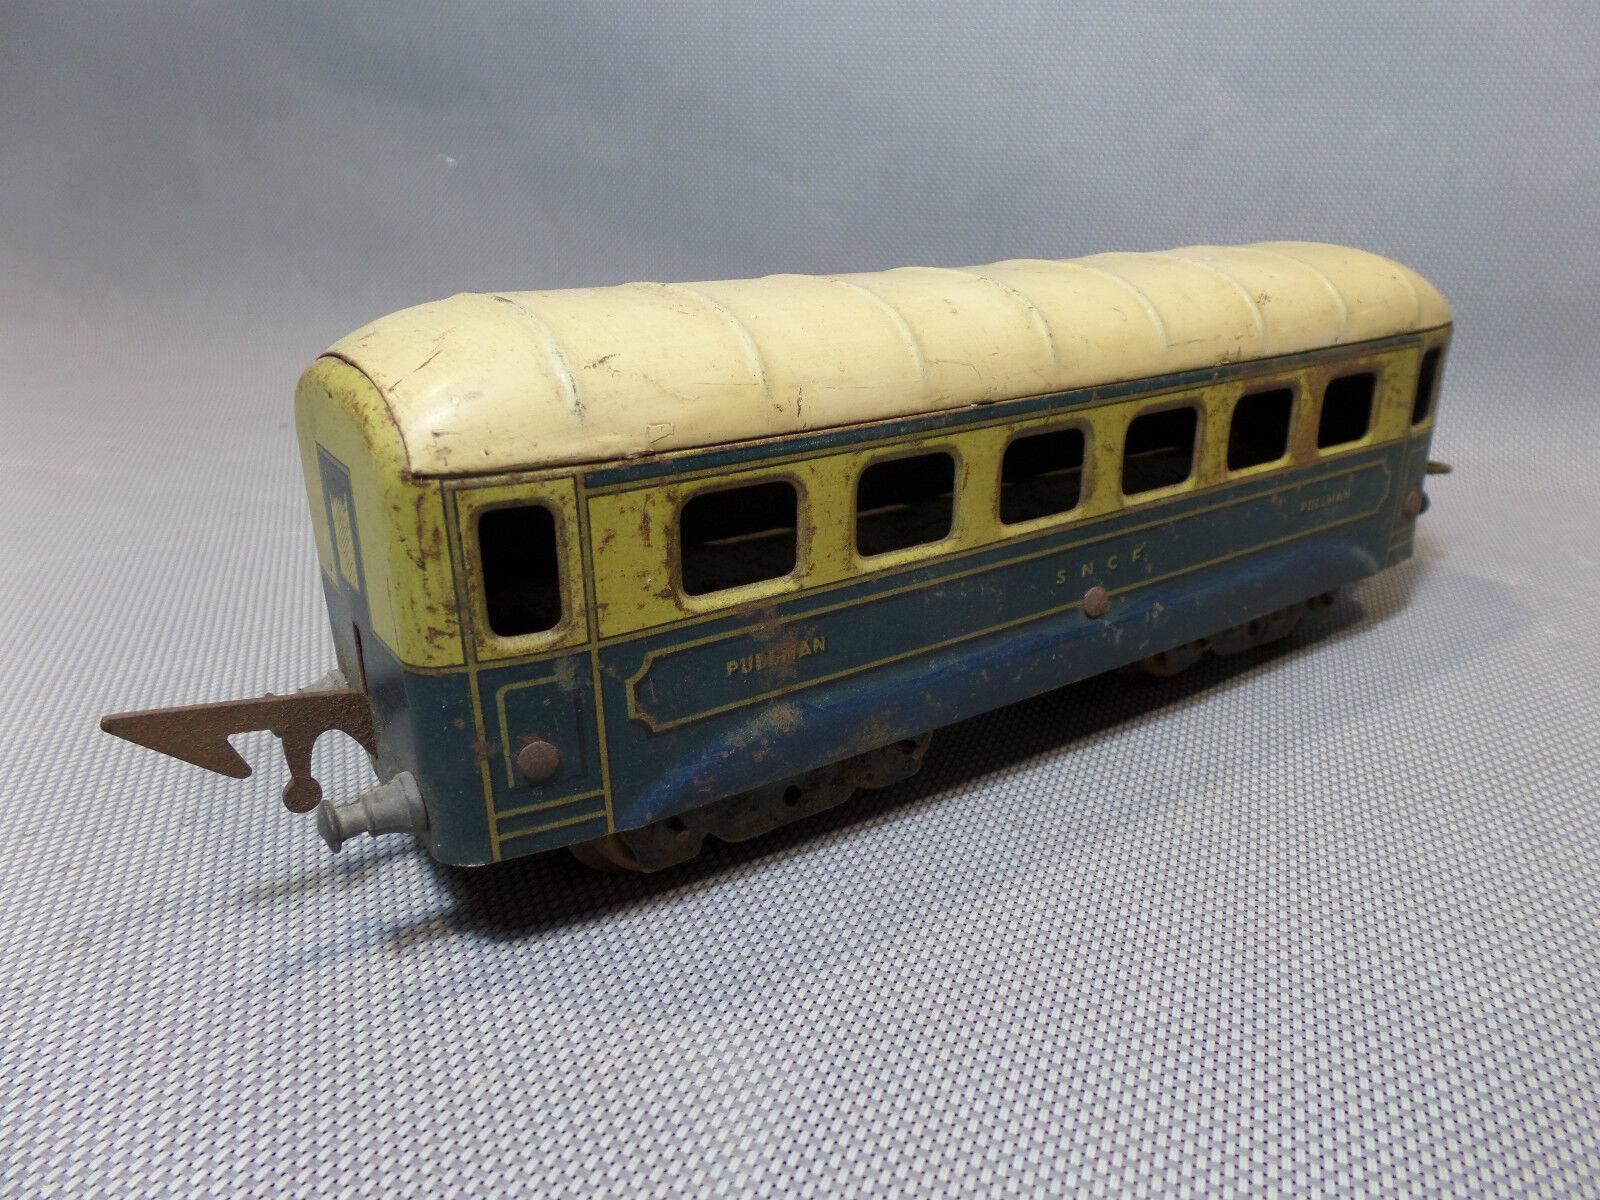 Wagon Pullman, Ehd SNCF , Hojalata, Completo, Escala 0